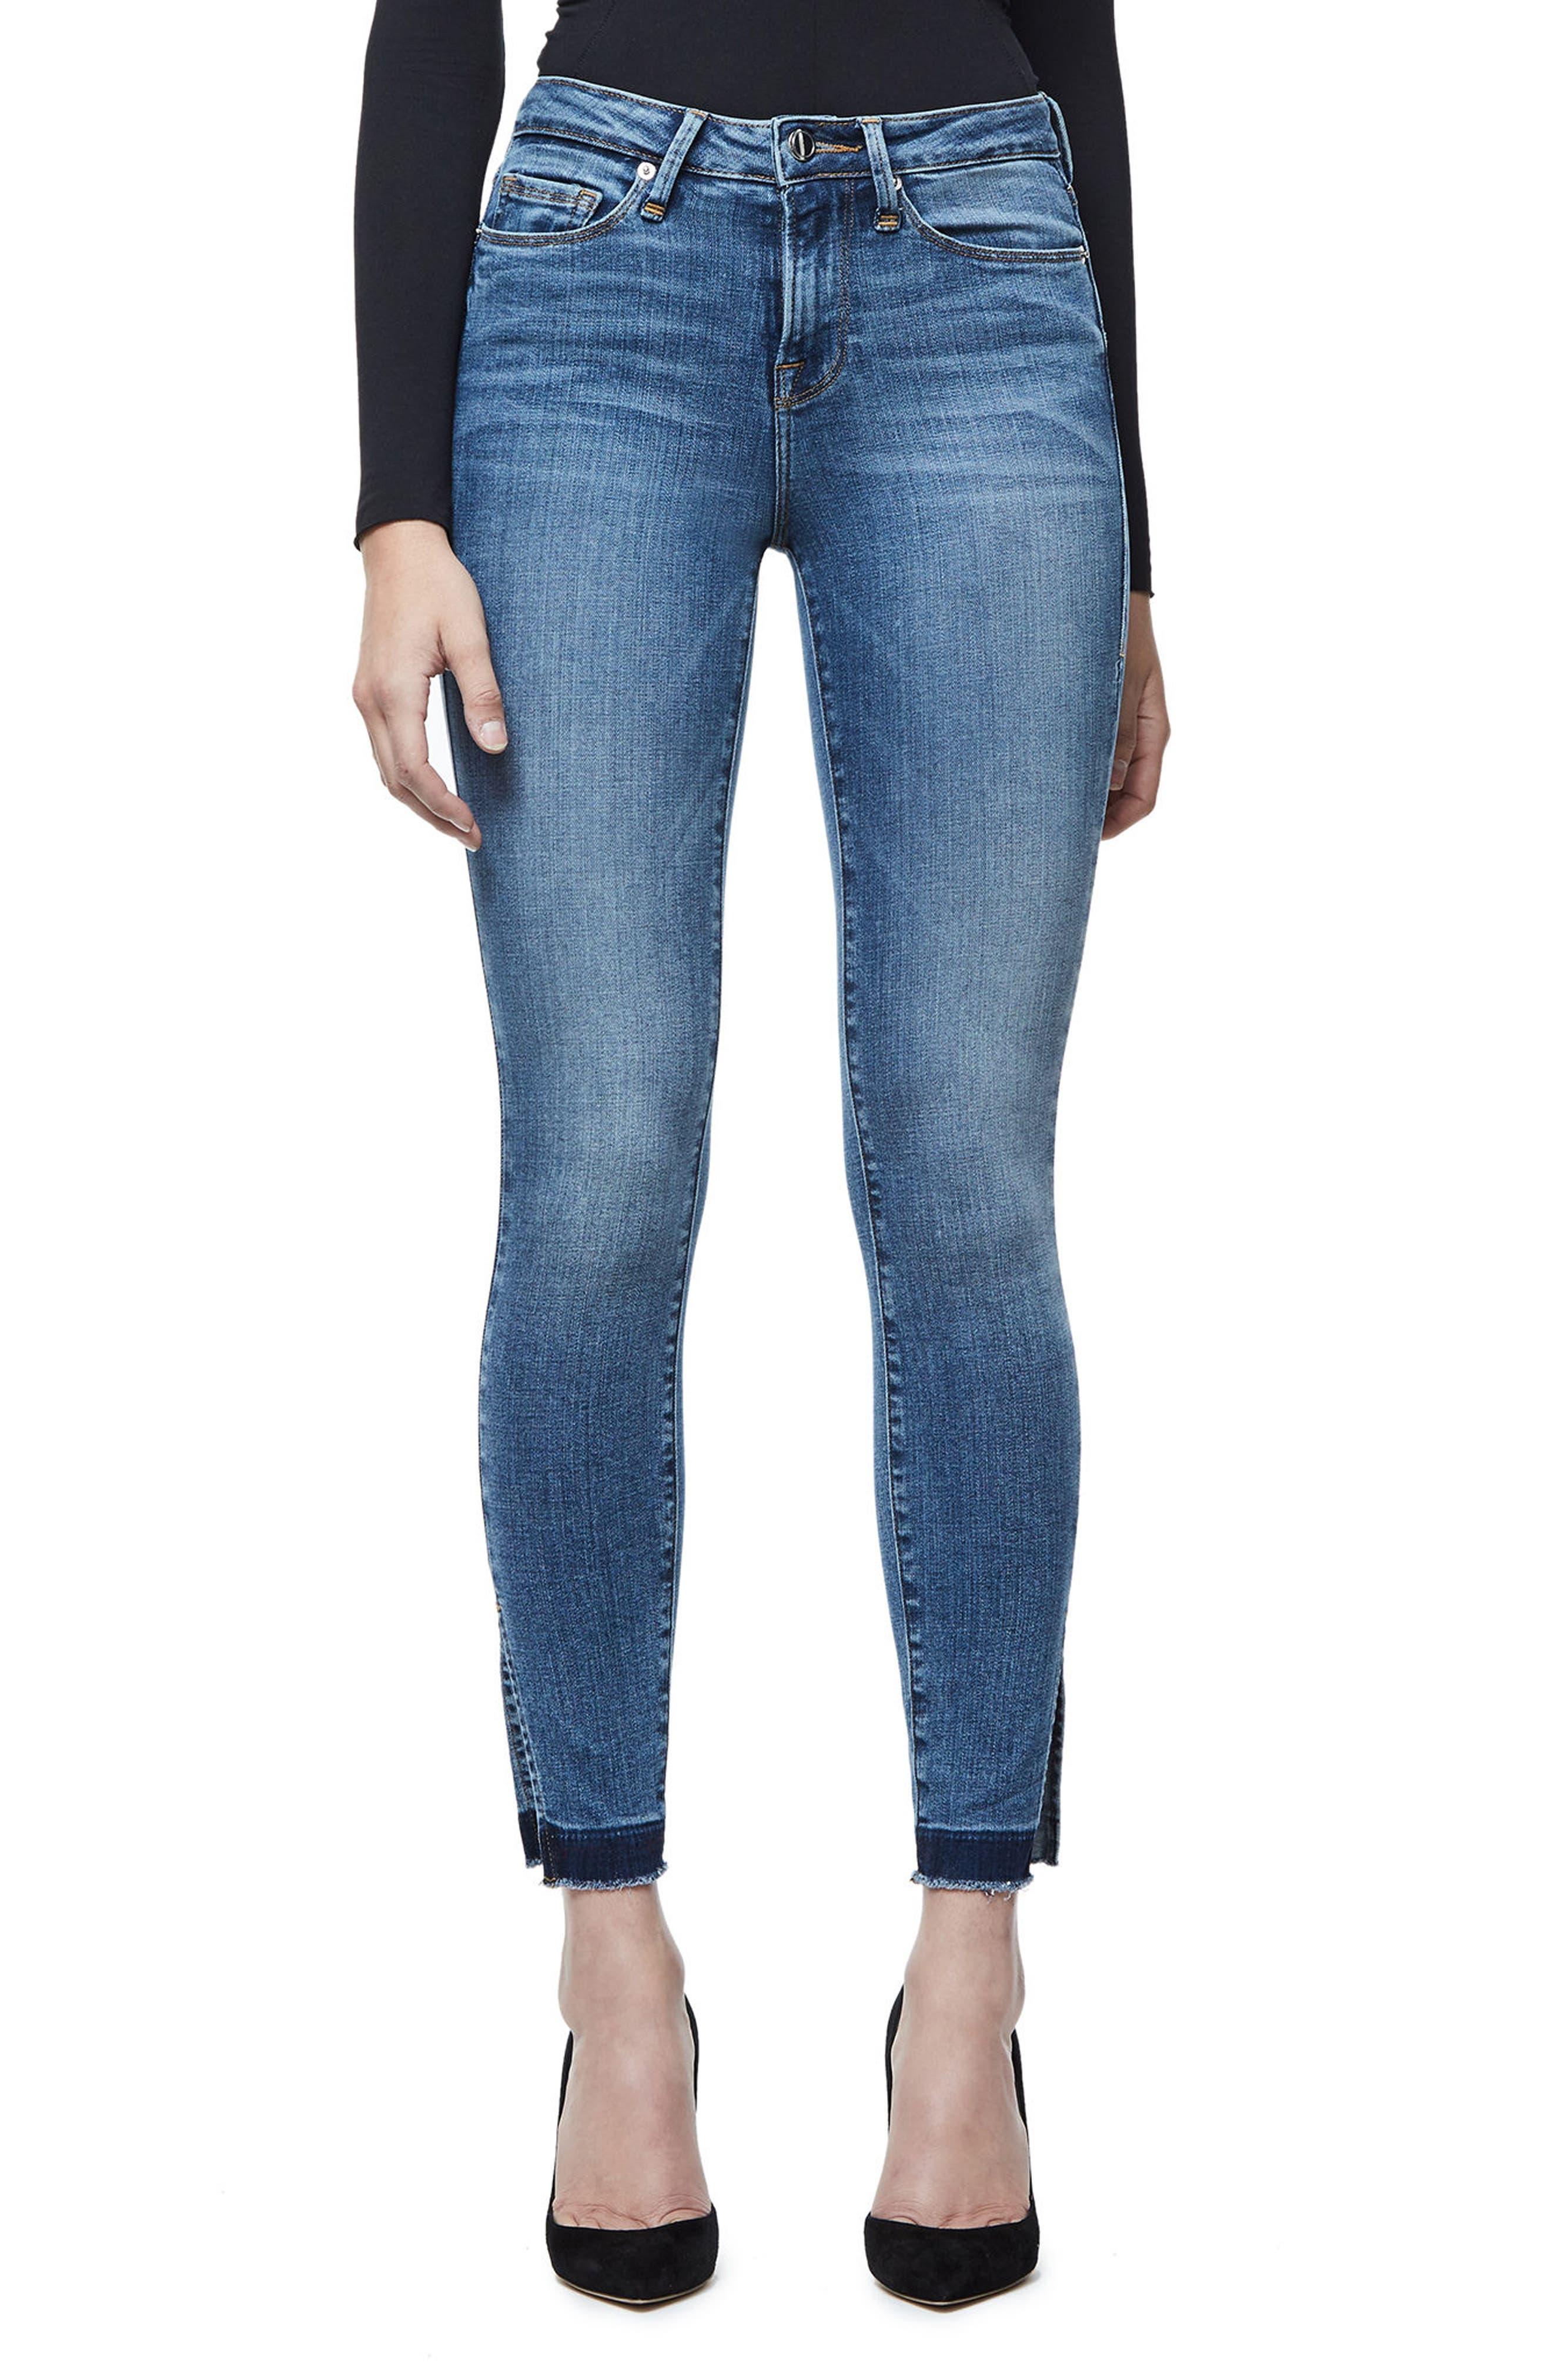 Alternate Image 1 Selected - Good American Good Legs High Rise Split Hem Crop Skinny Jeans (Blue 061)